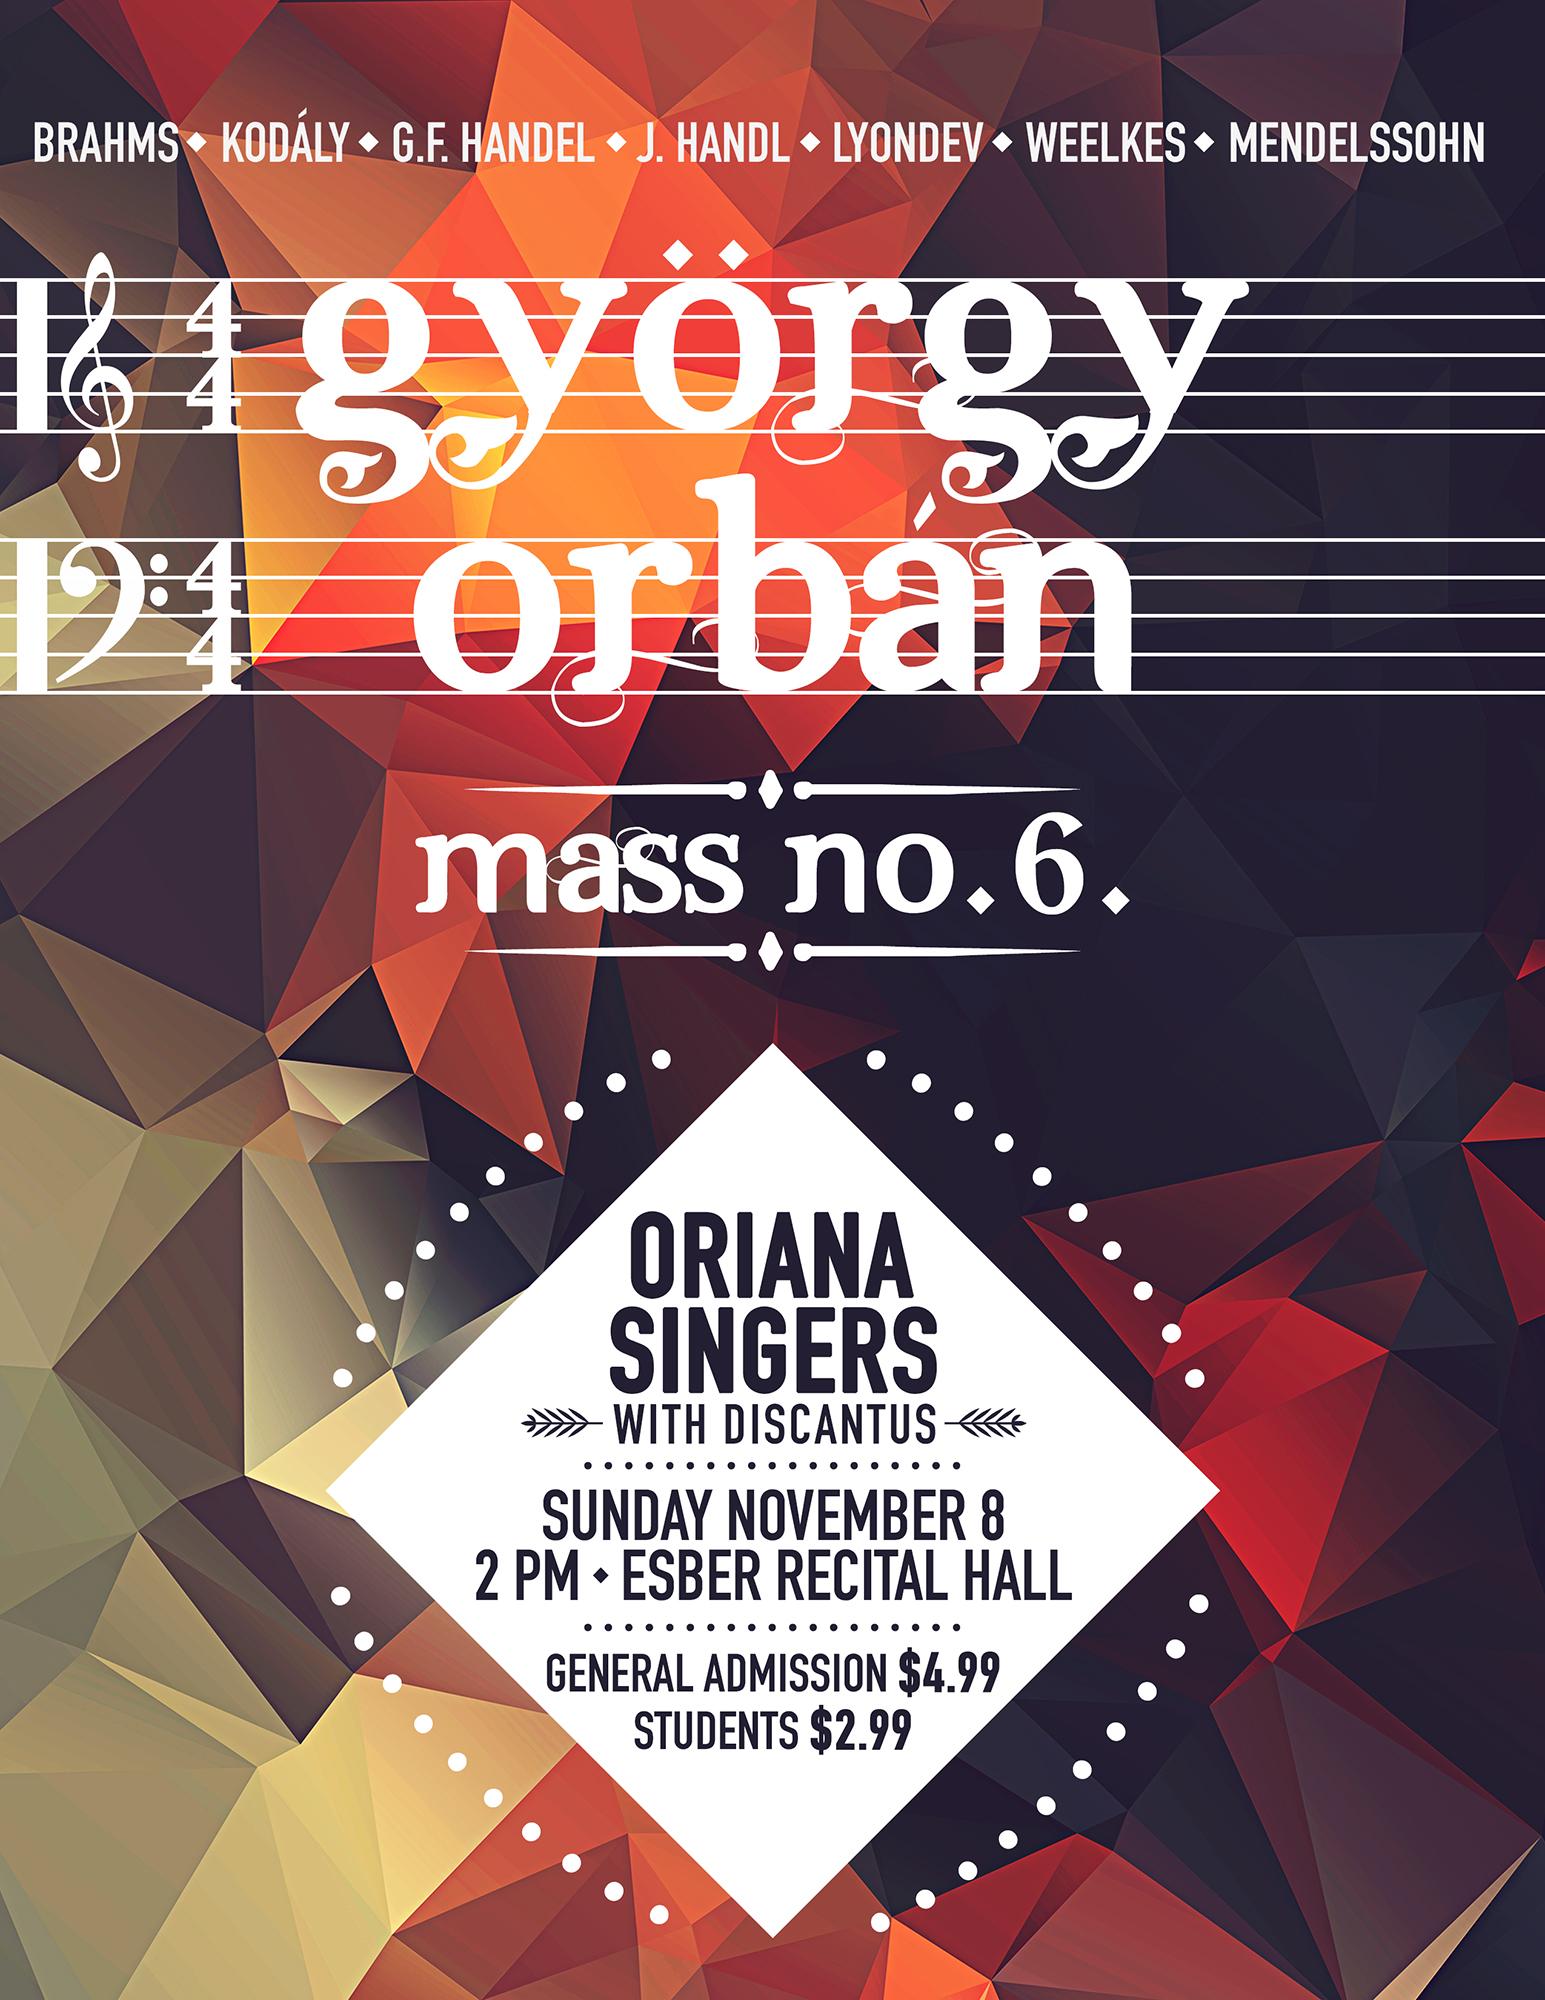 Poster design for a choir concert.